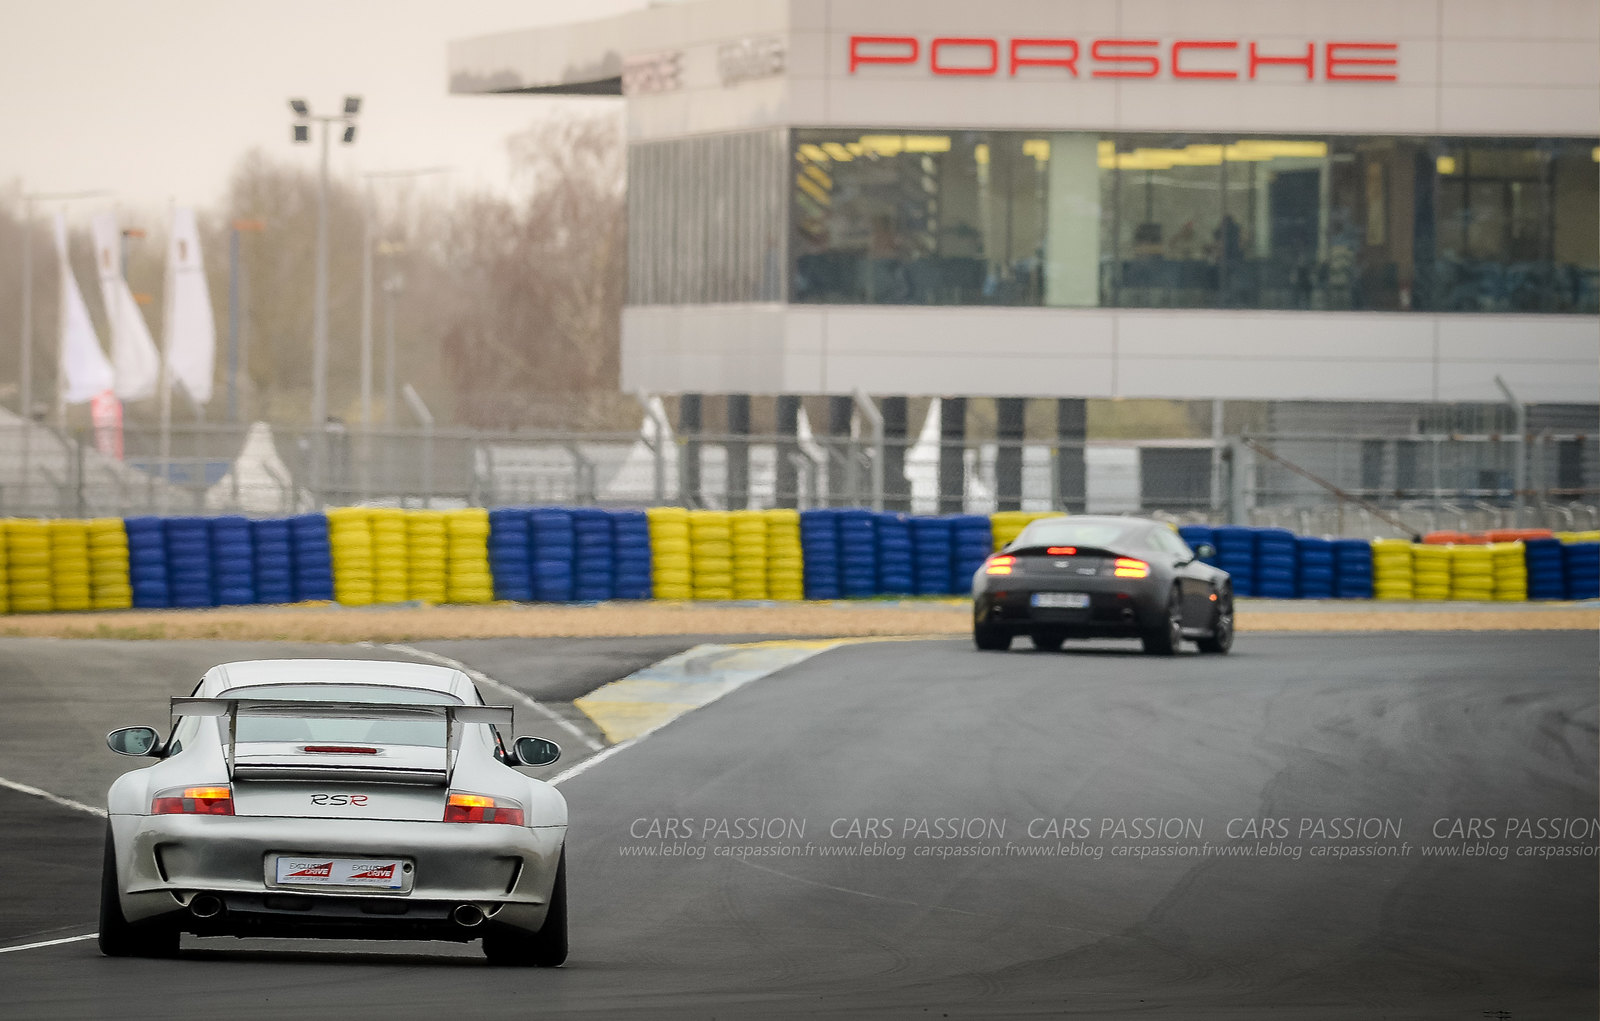 exclusive-drive-supercars-ferrari-porsche-alfa (3)